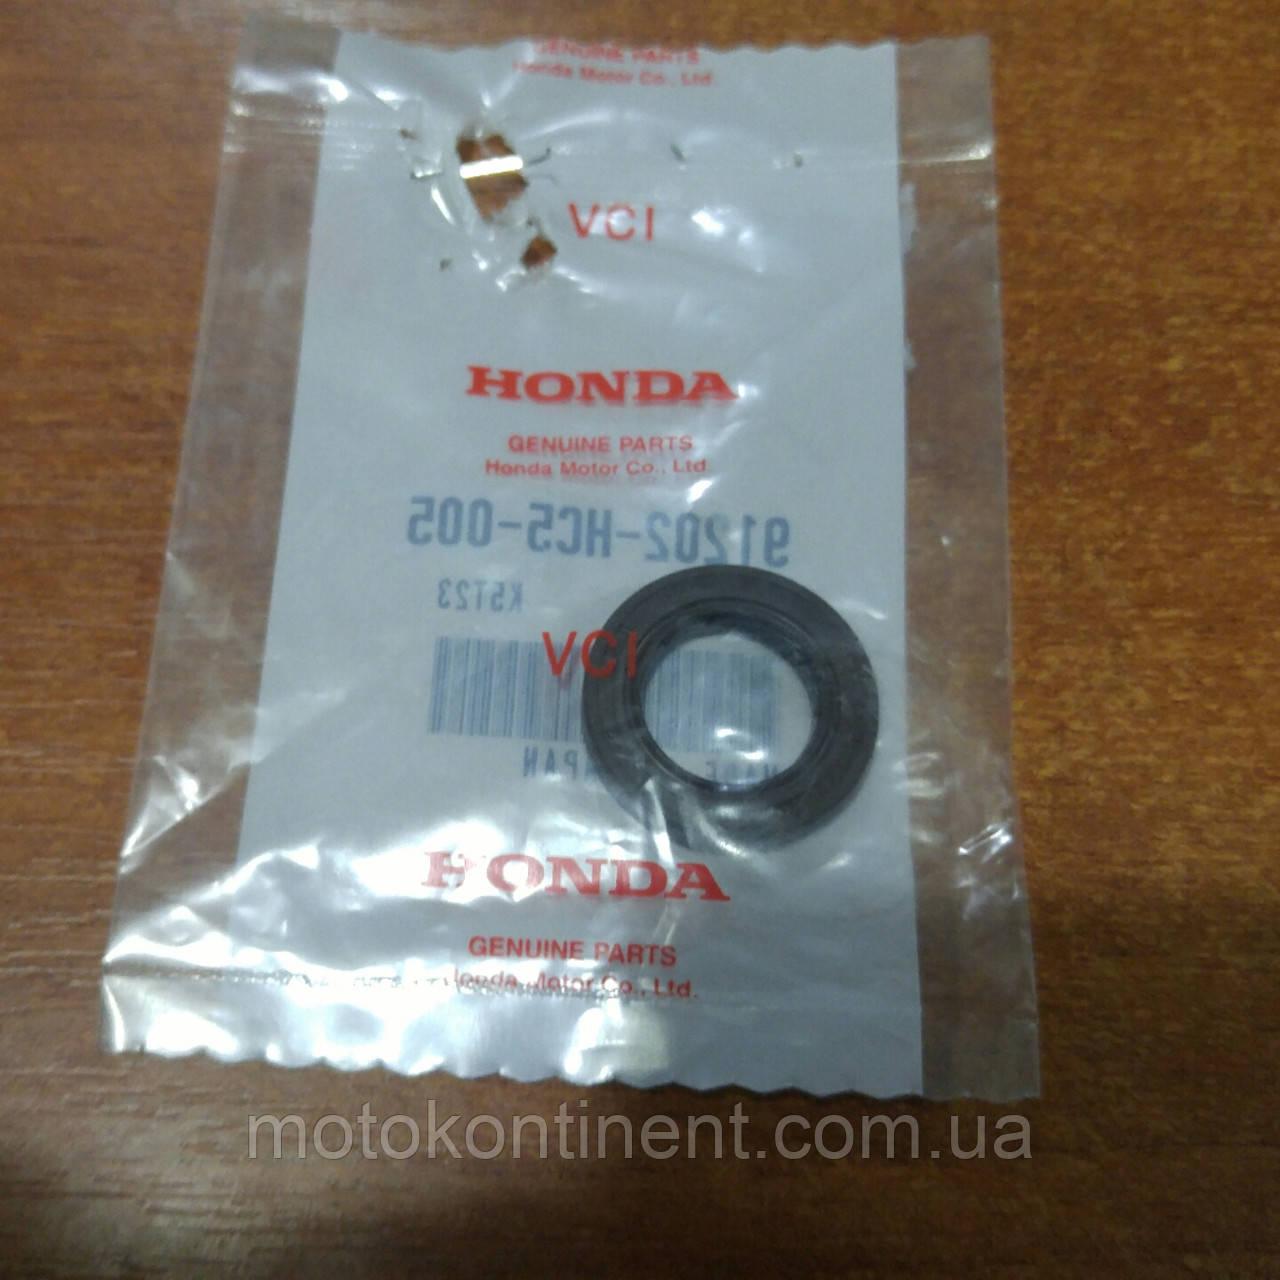 91202-HC5-005 Сальник коленвала 17x27x5 Honda BF2/BF2.3